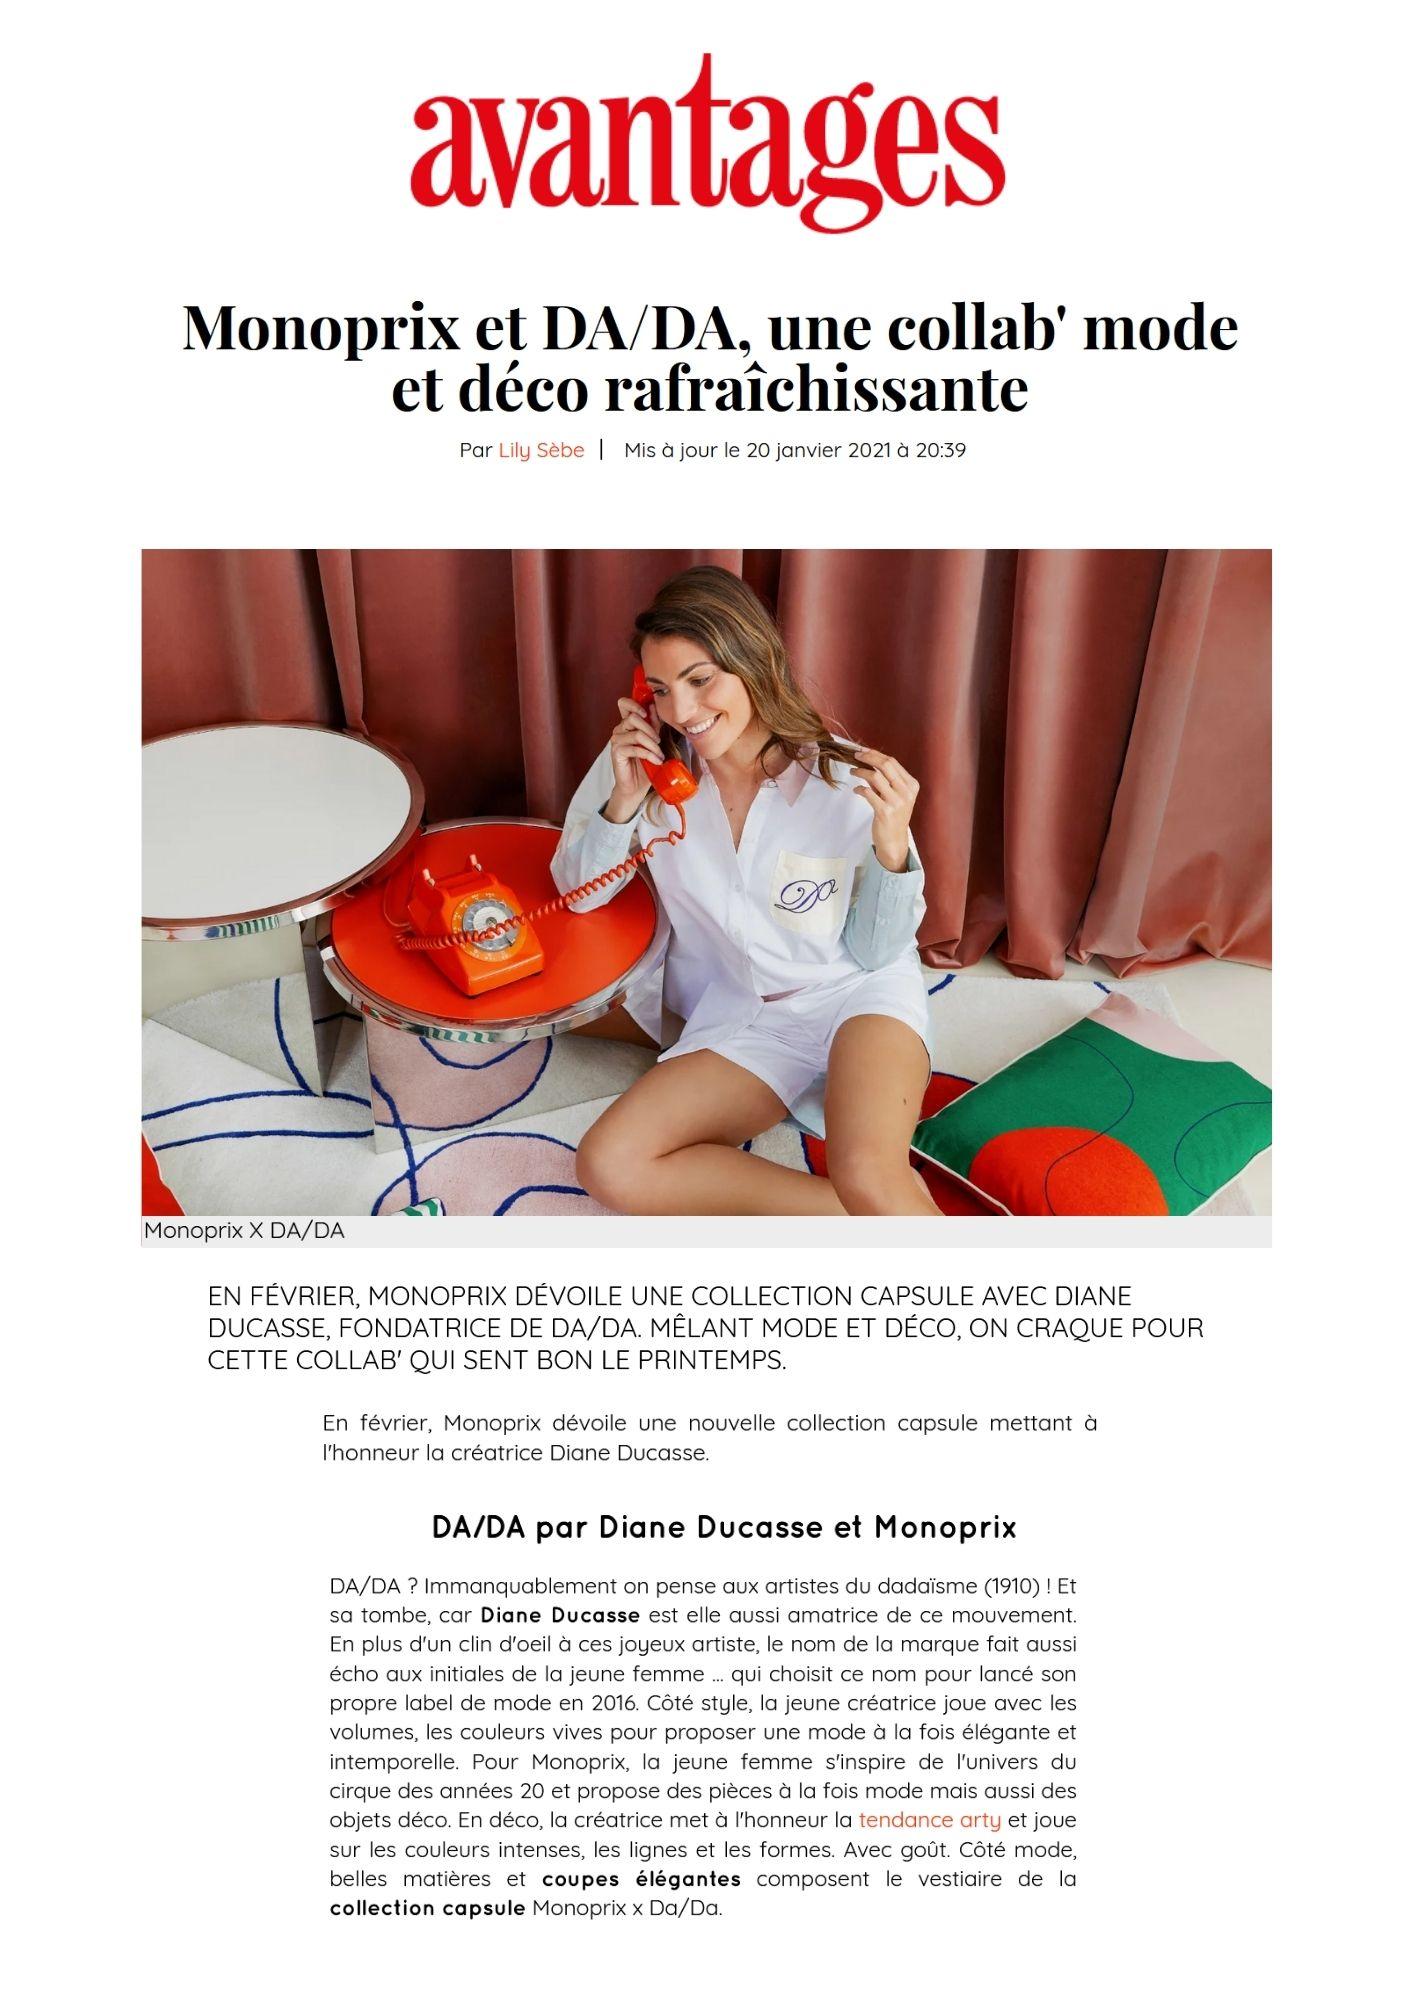 dada-diane-ducasse-avantages-presse-janvier-2021-1